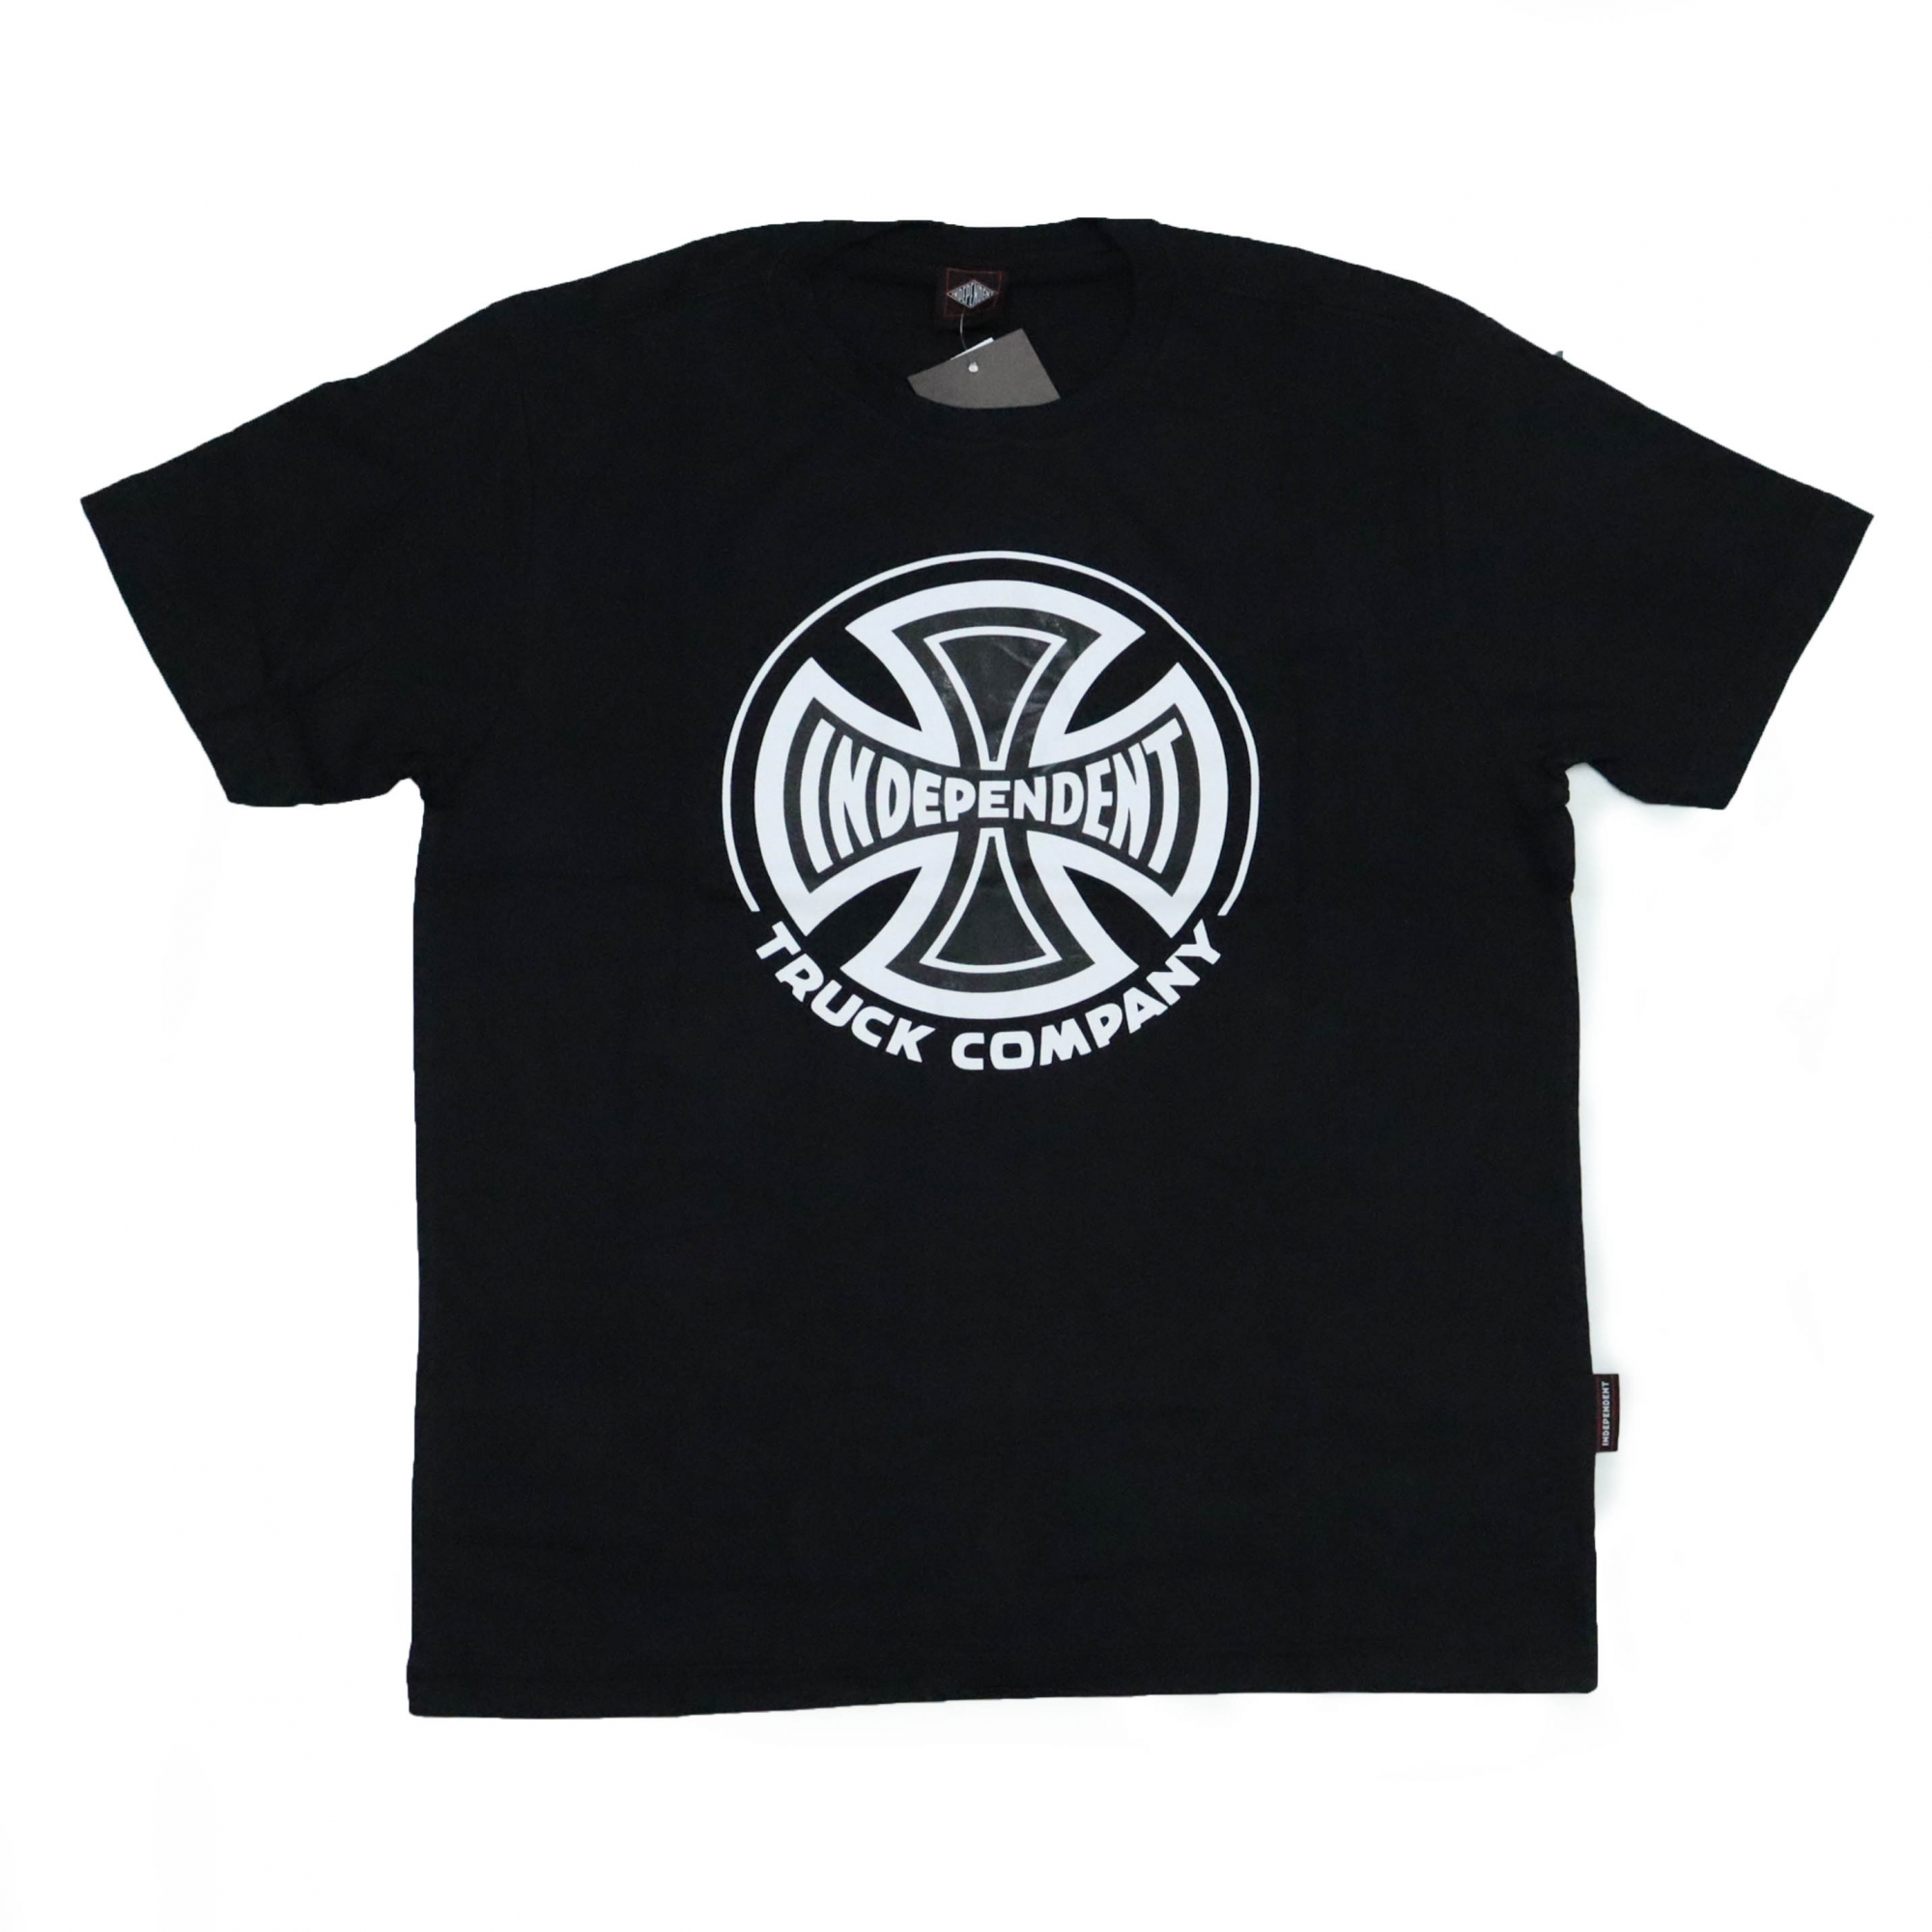 Camiseta Independent Truck Co 2 Colors - Preto